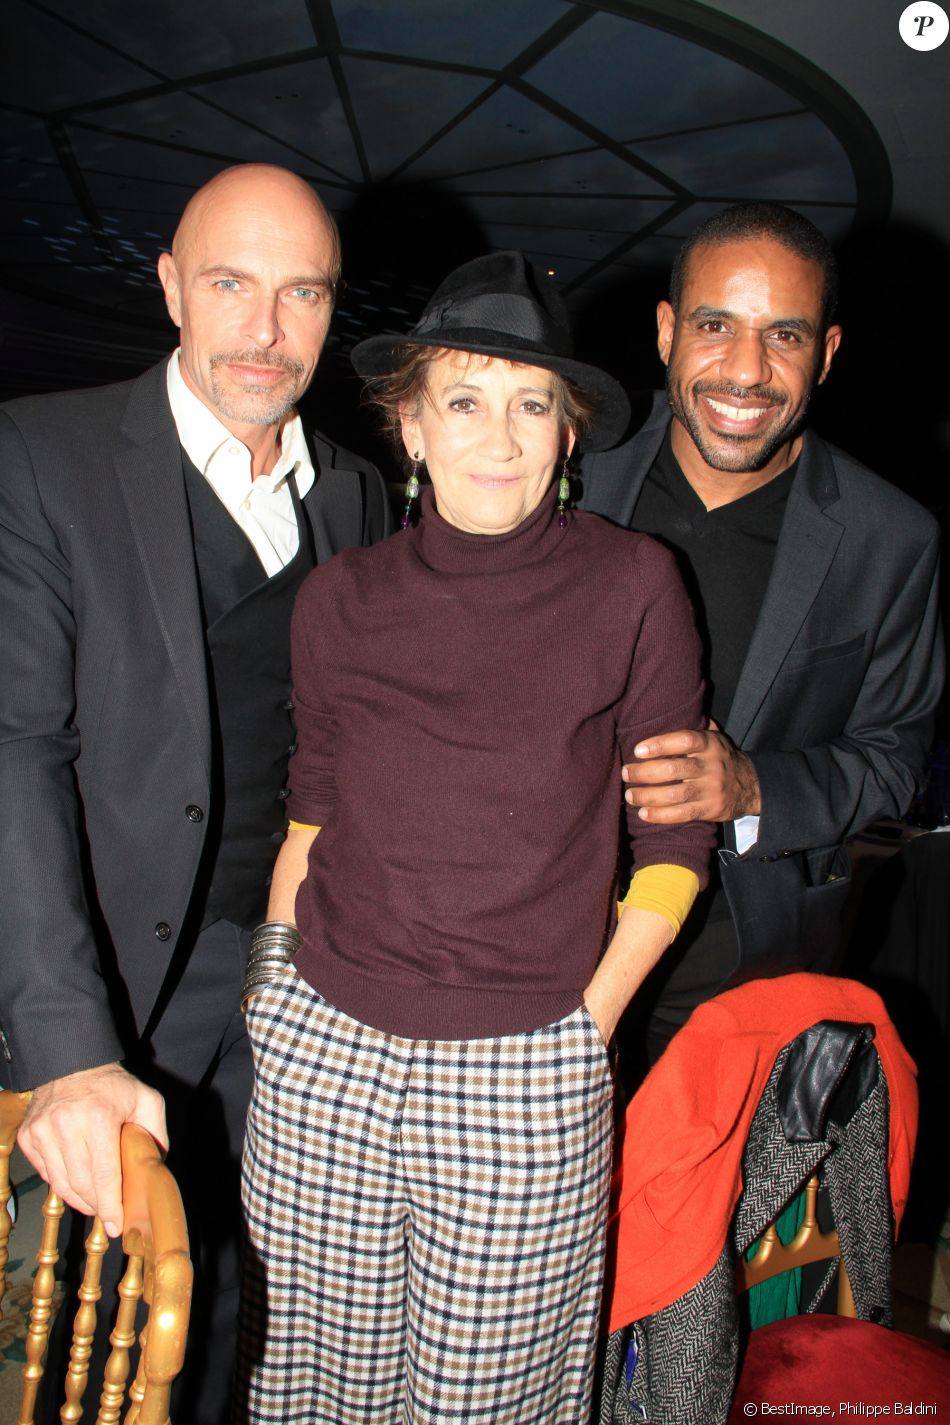 Guy Amram, Caroline Loeb, Loup-Denis Elion - L'association ...